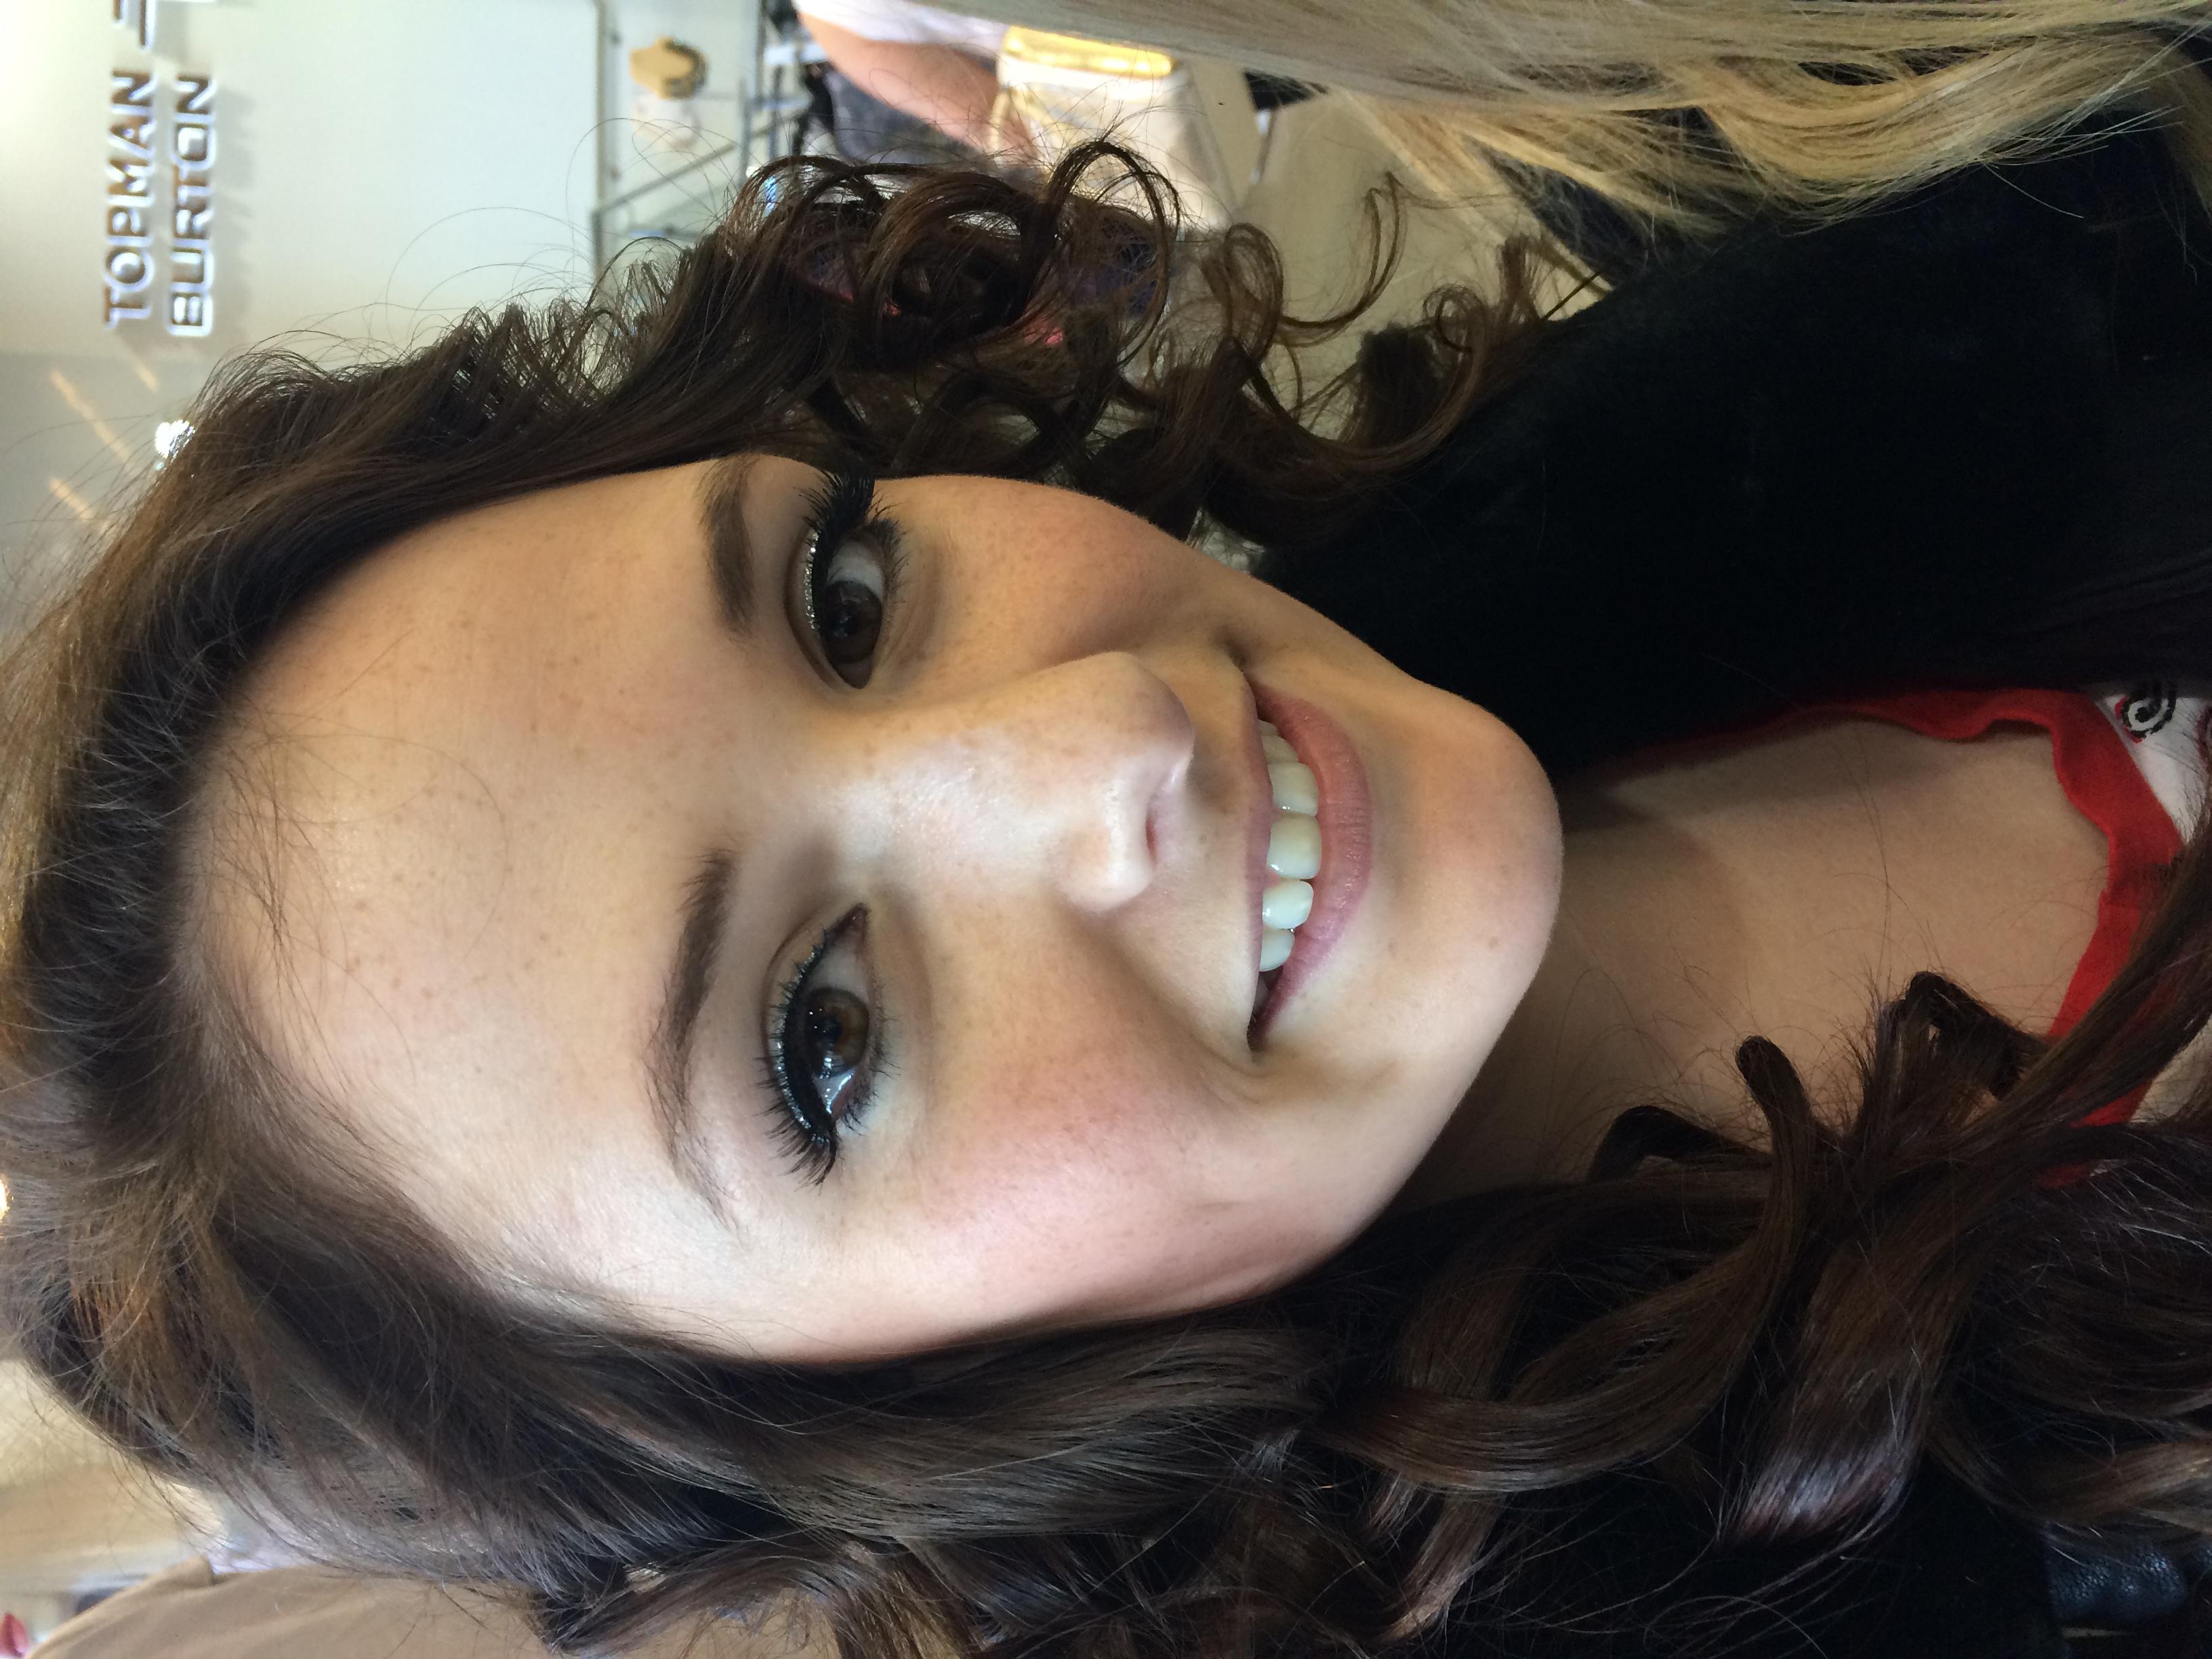 Make Up Artist Liverpool - Eyelash Bar (Eyelure lashes)